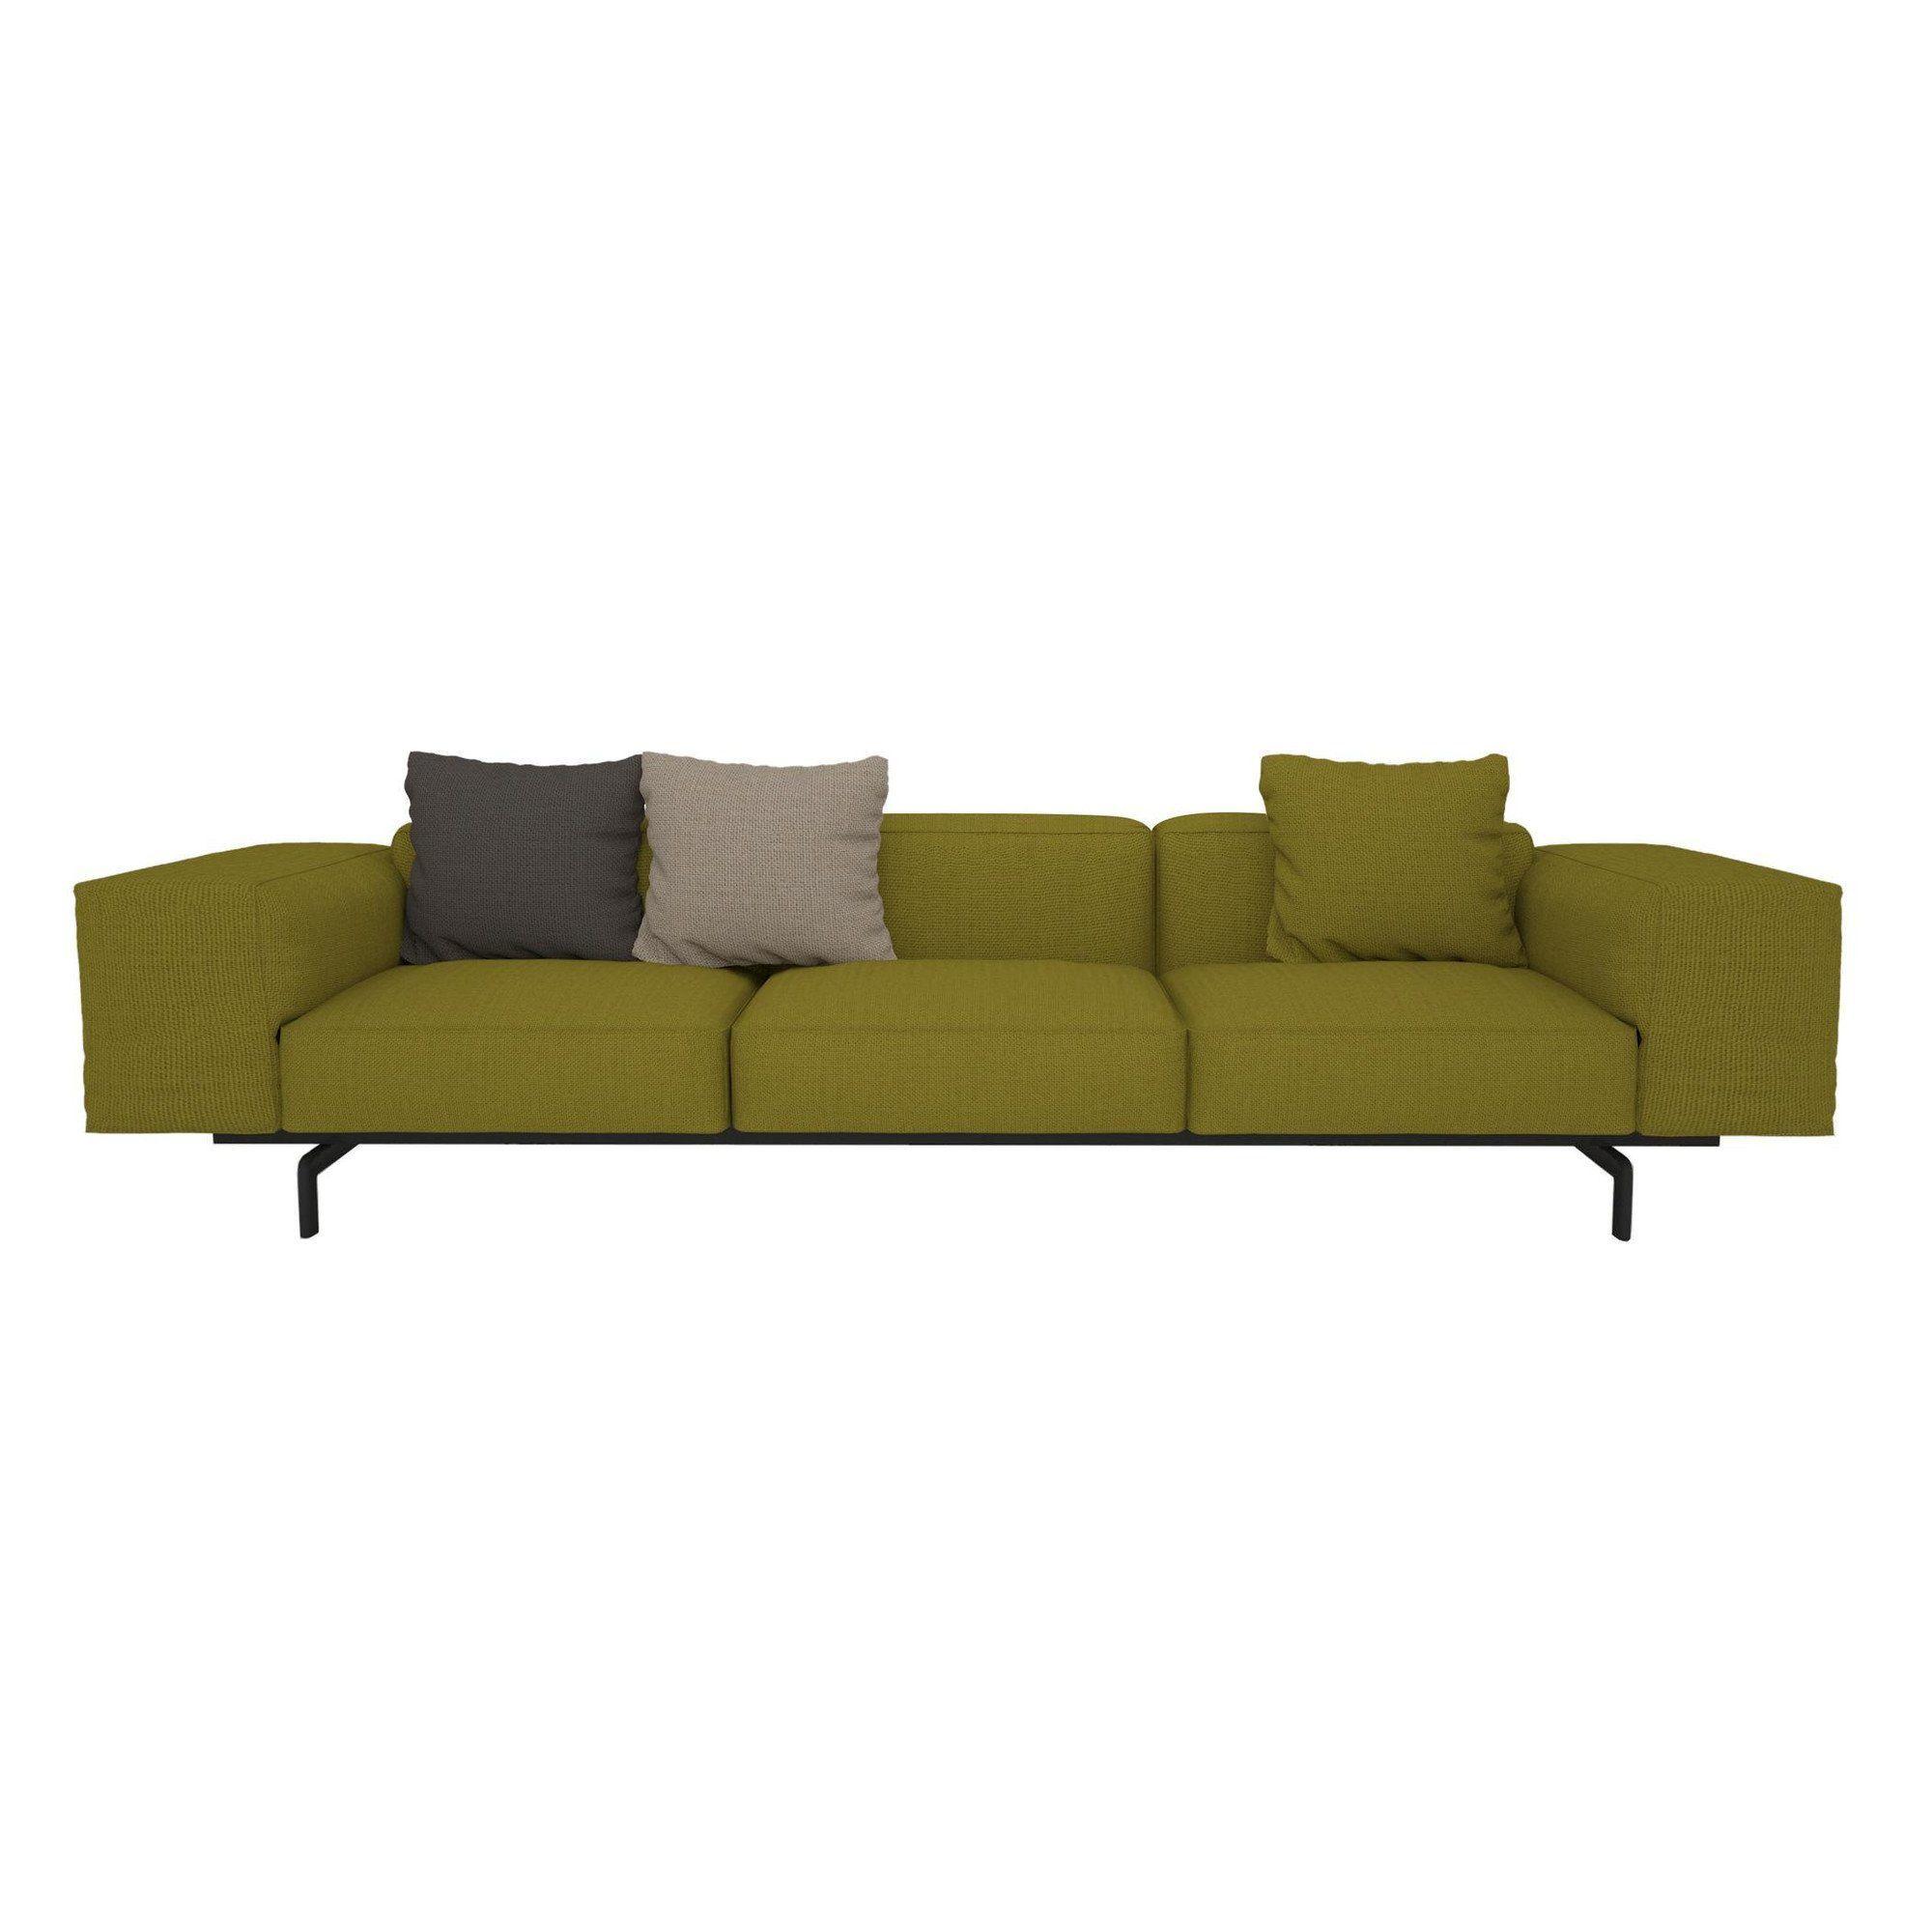 kartell sofa largo contemporary leather 3 sitzer ambientedirect